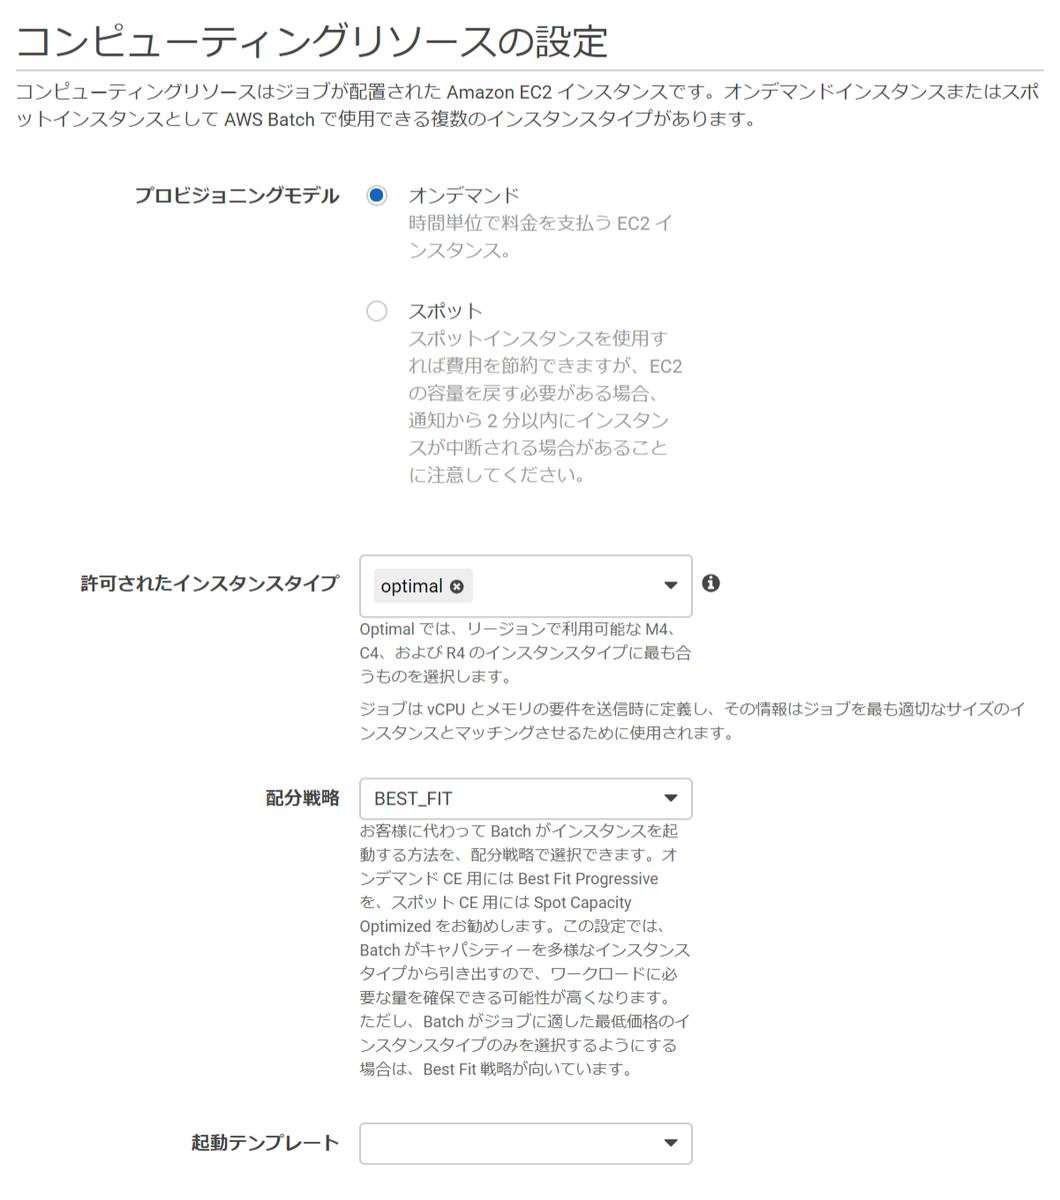 f:id:teco_mochi:20200303212049p:plain